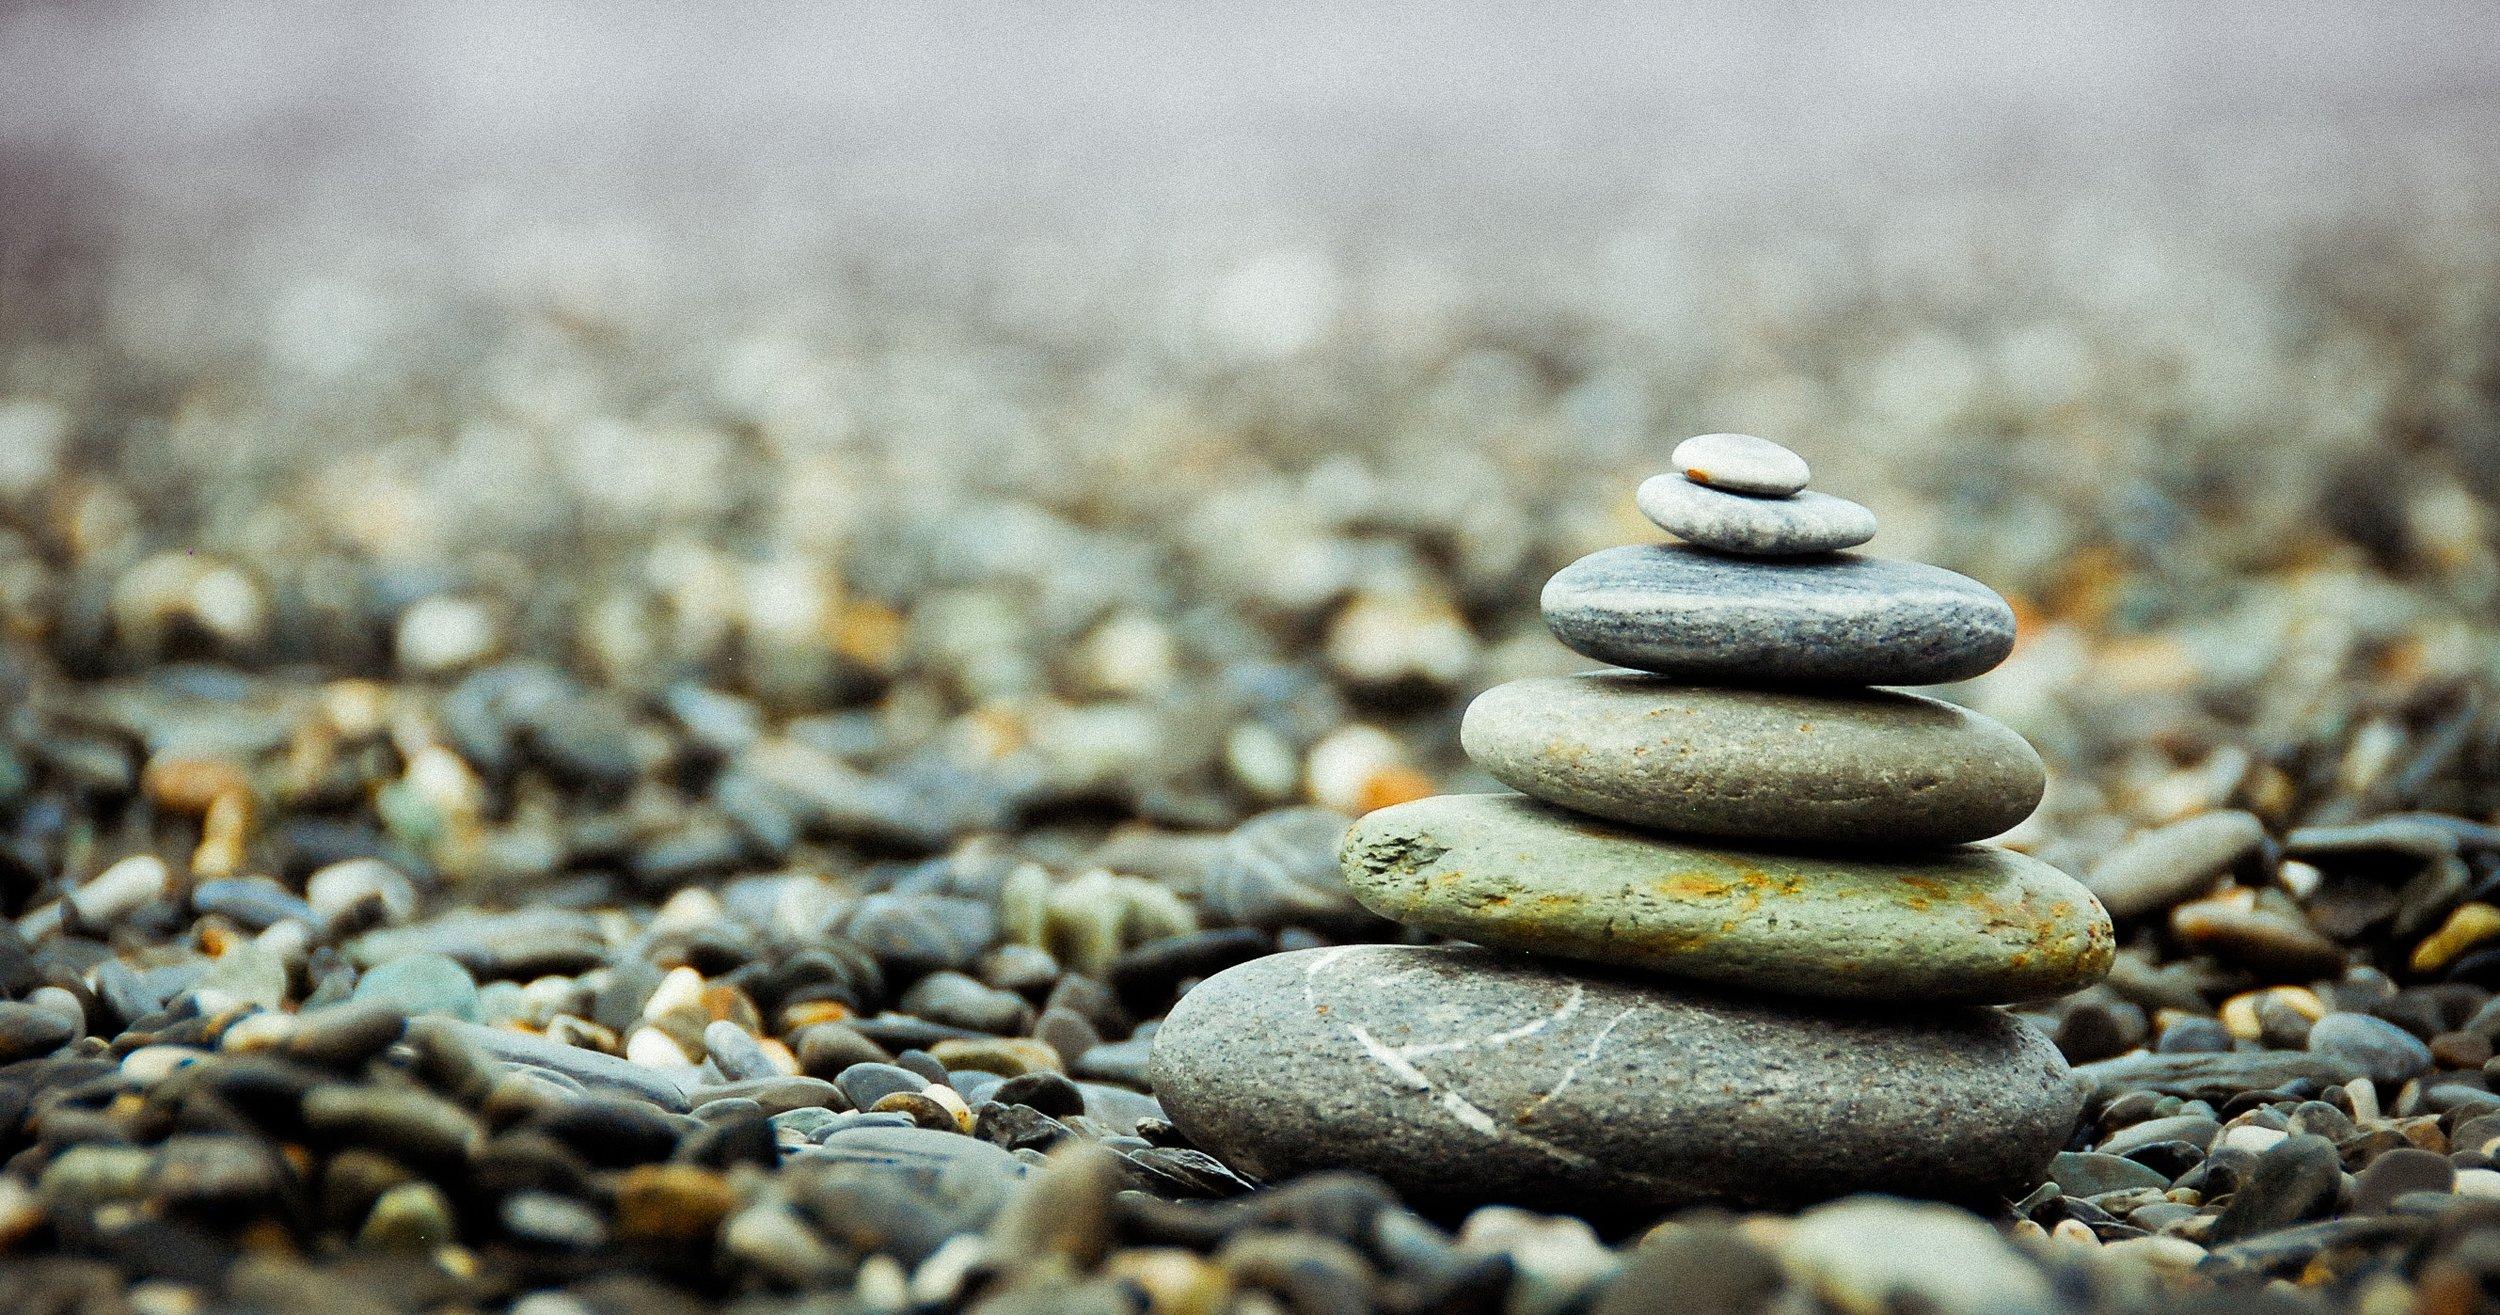 piedras.jpg